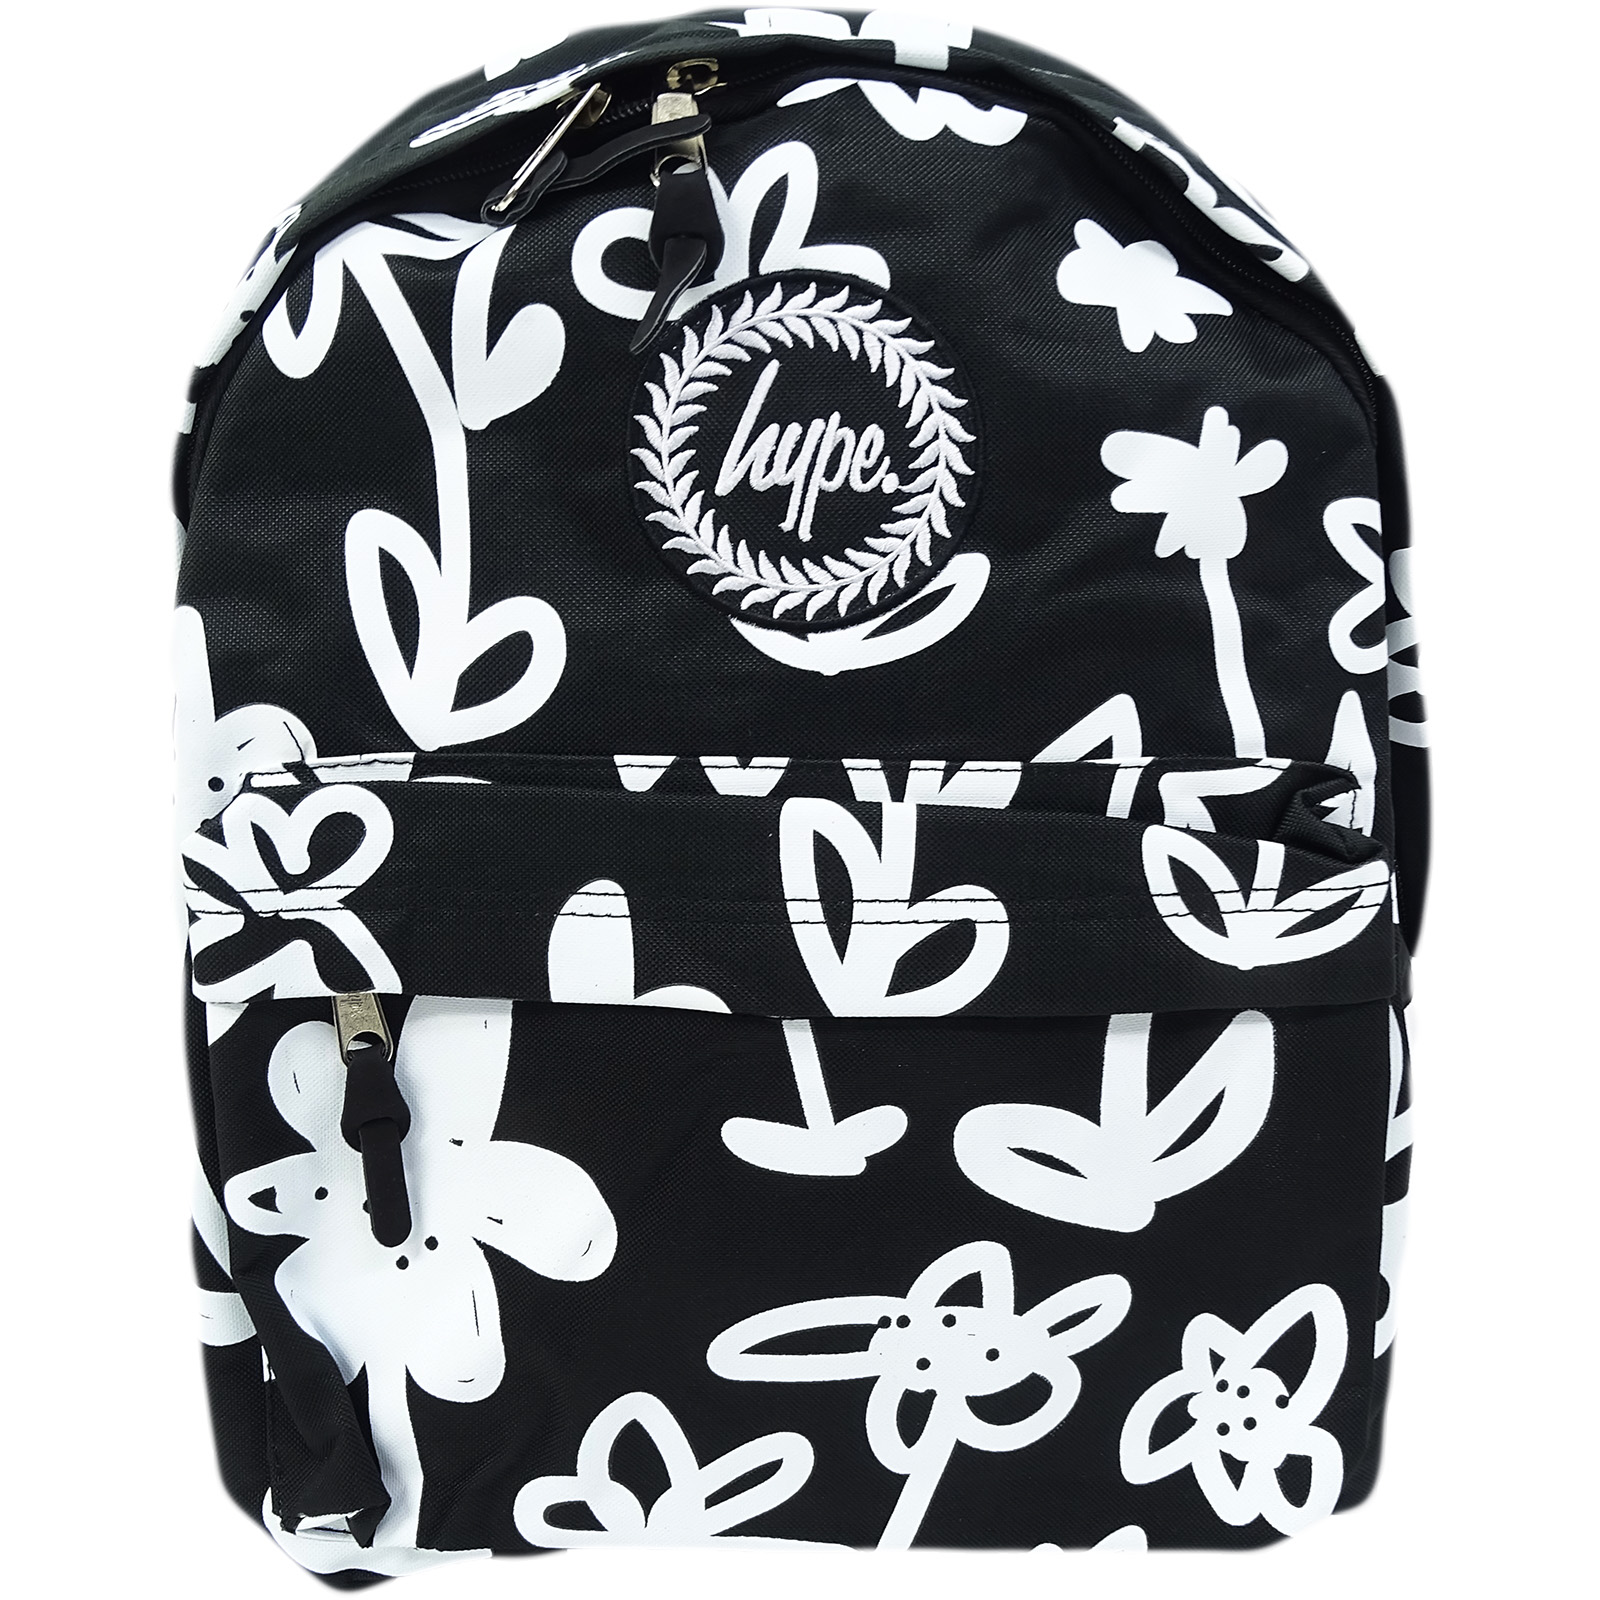 Hype Black / White Backpack / Rucksack Bag Hand Style Floral